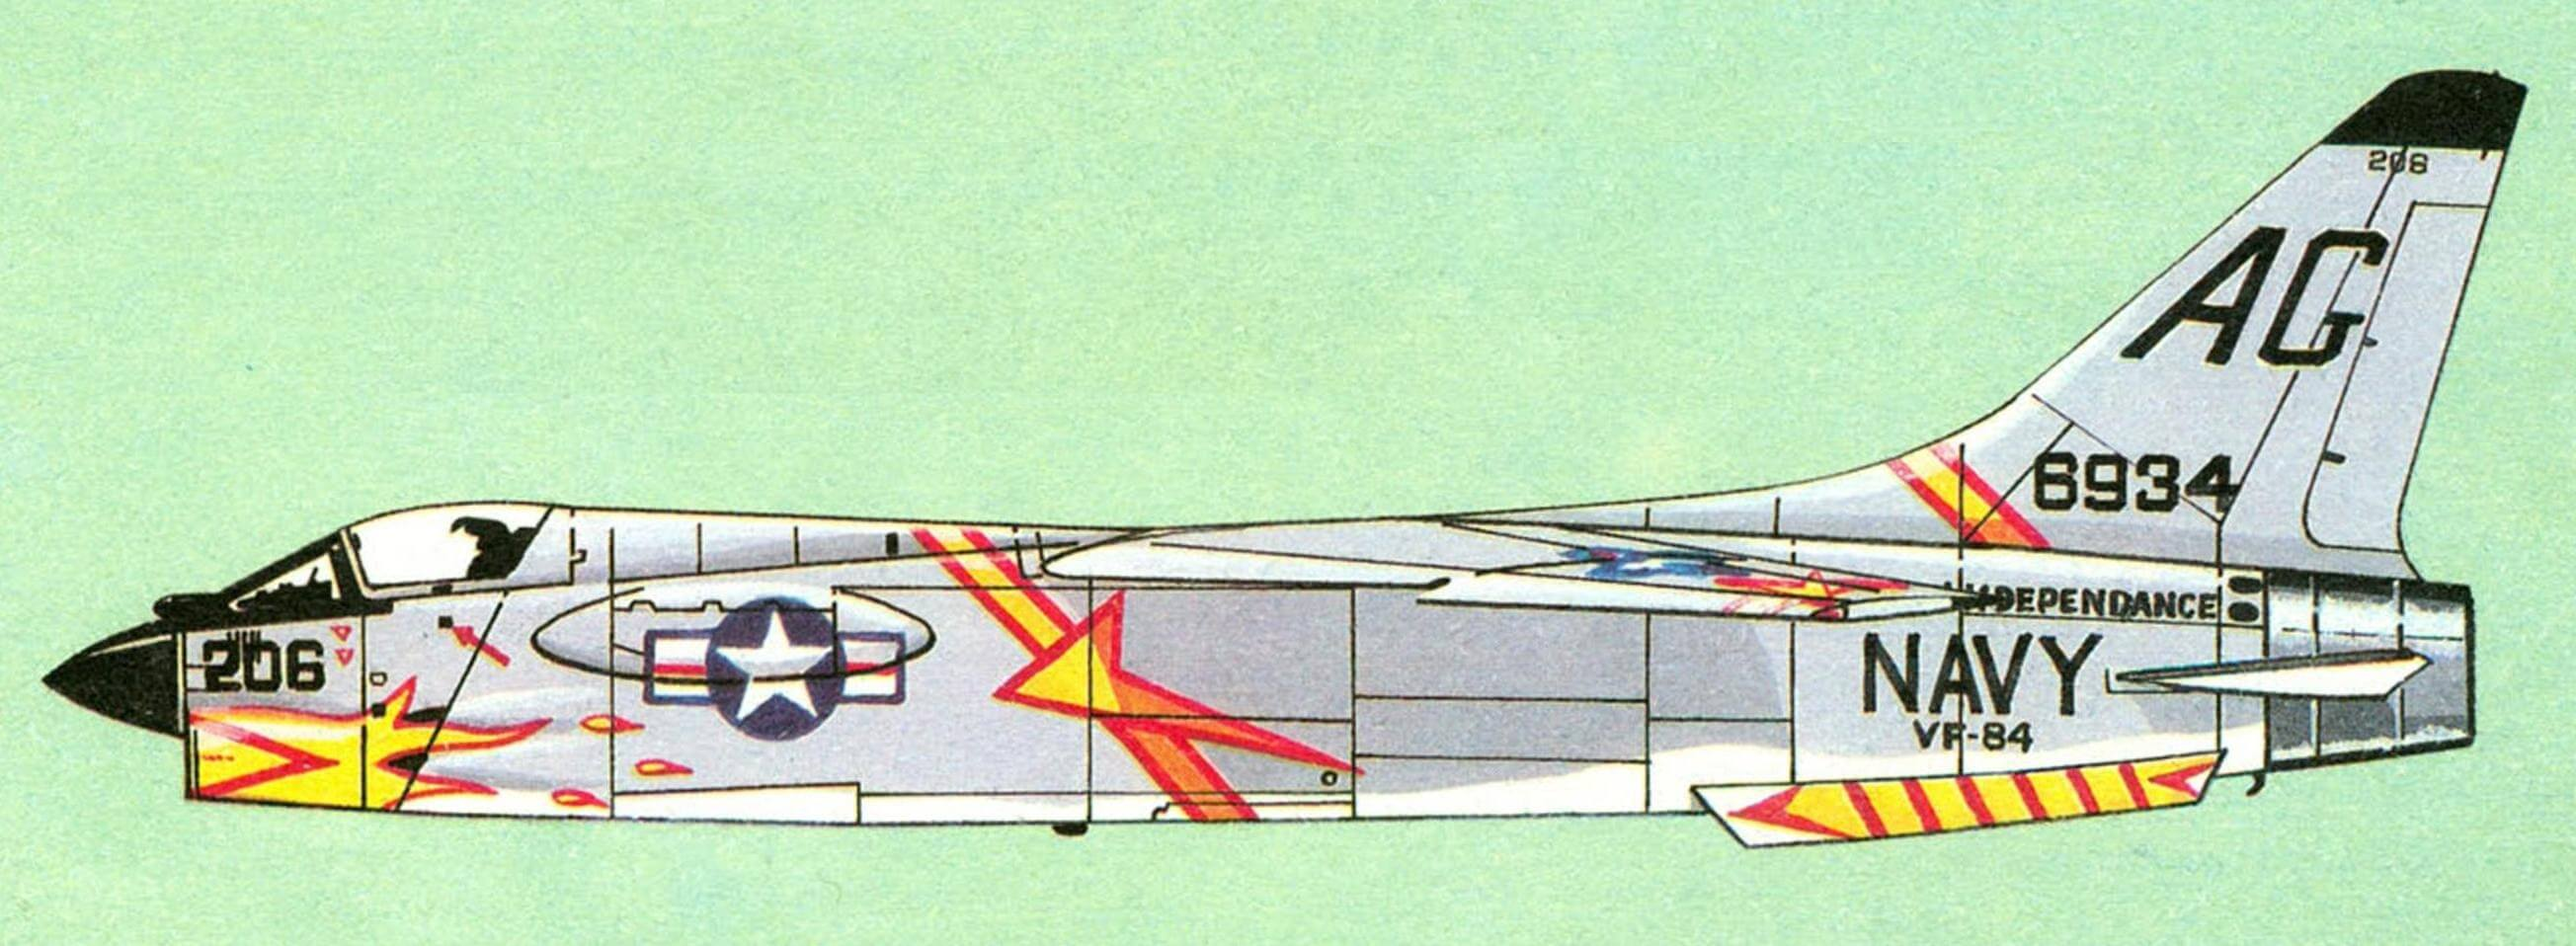 F8U-2 (F-8C) эскадрильи VF-84, авианосец «Independence».